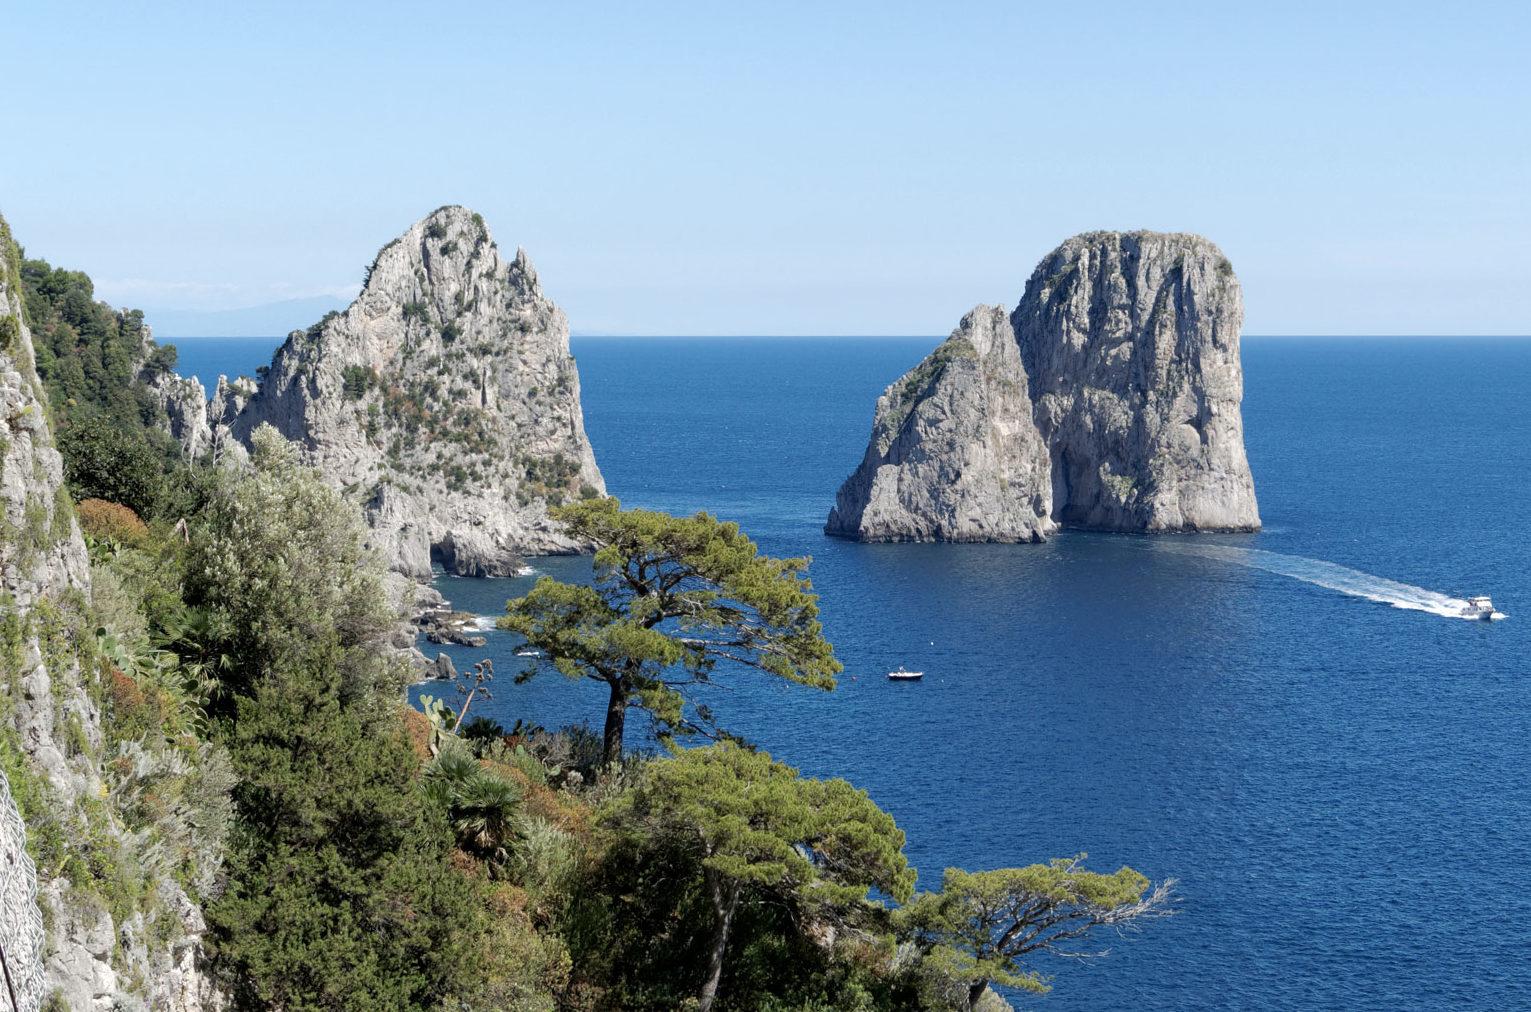 Romantic, seductive and irresistible: the Grand Tour of Capri!